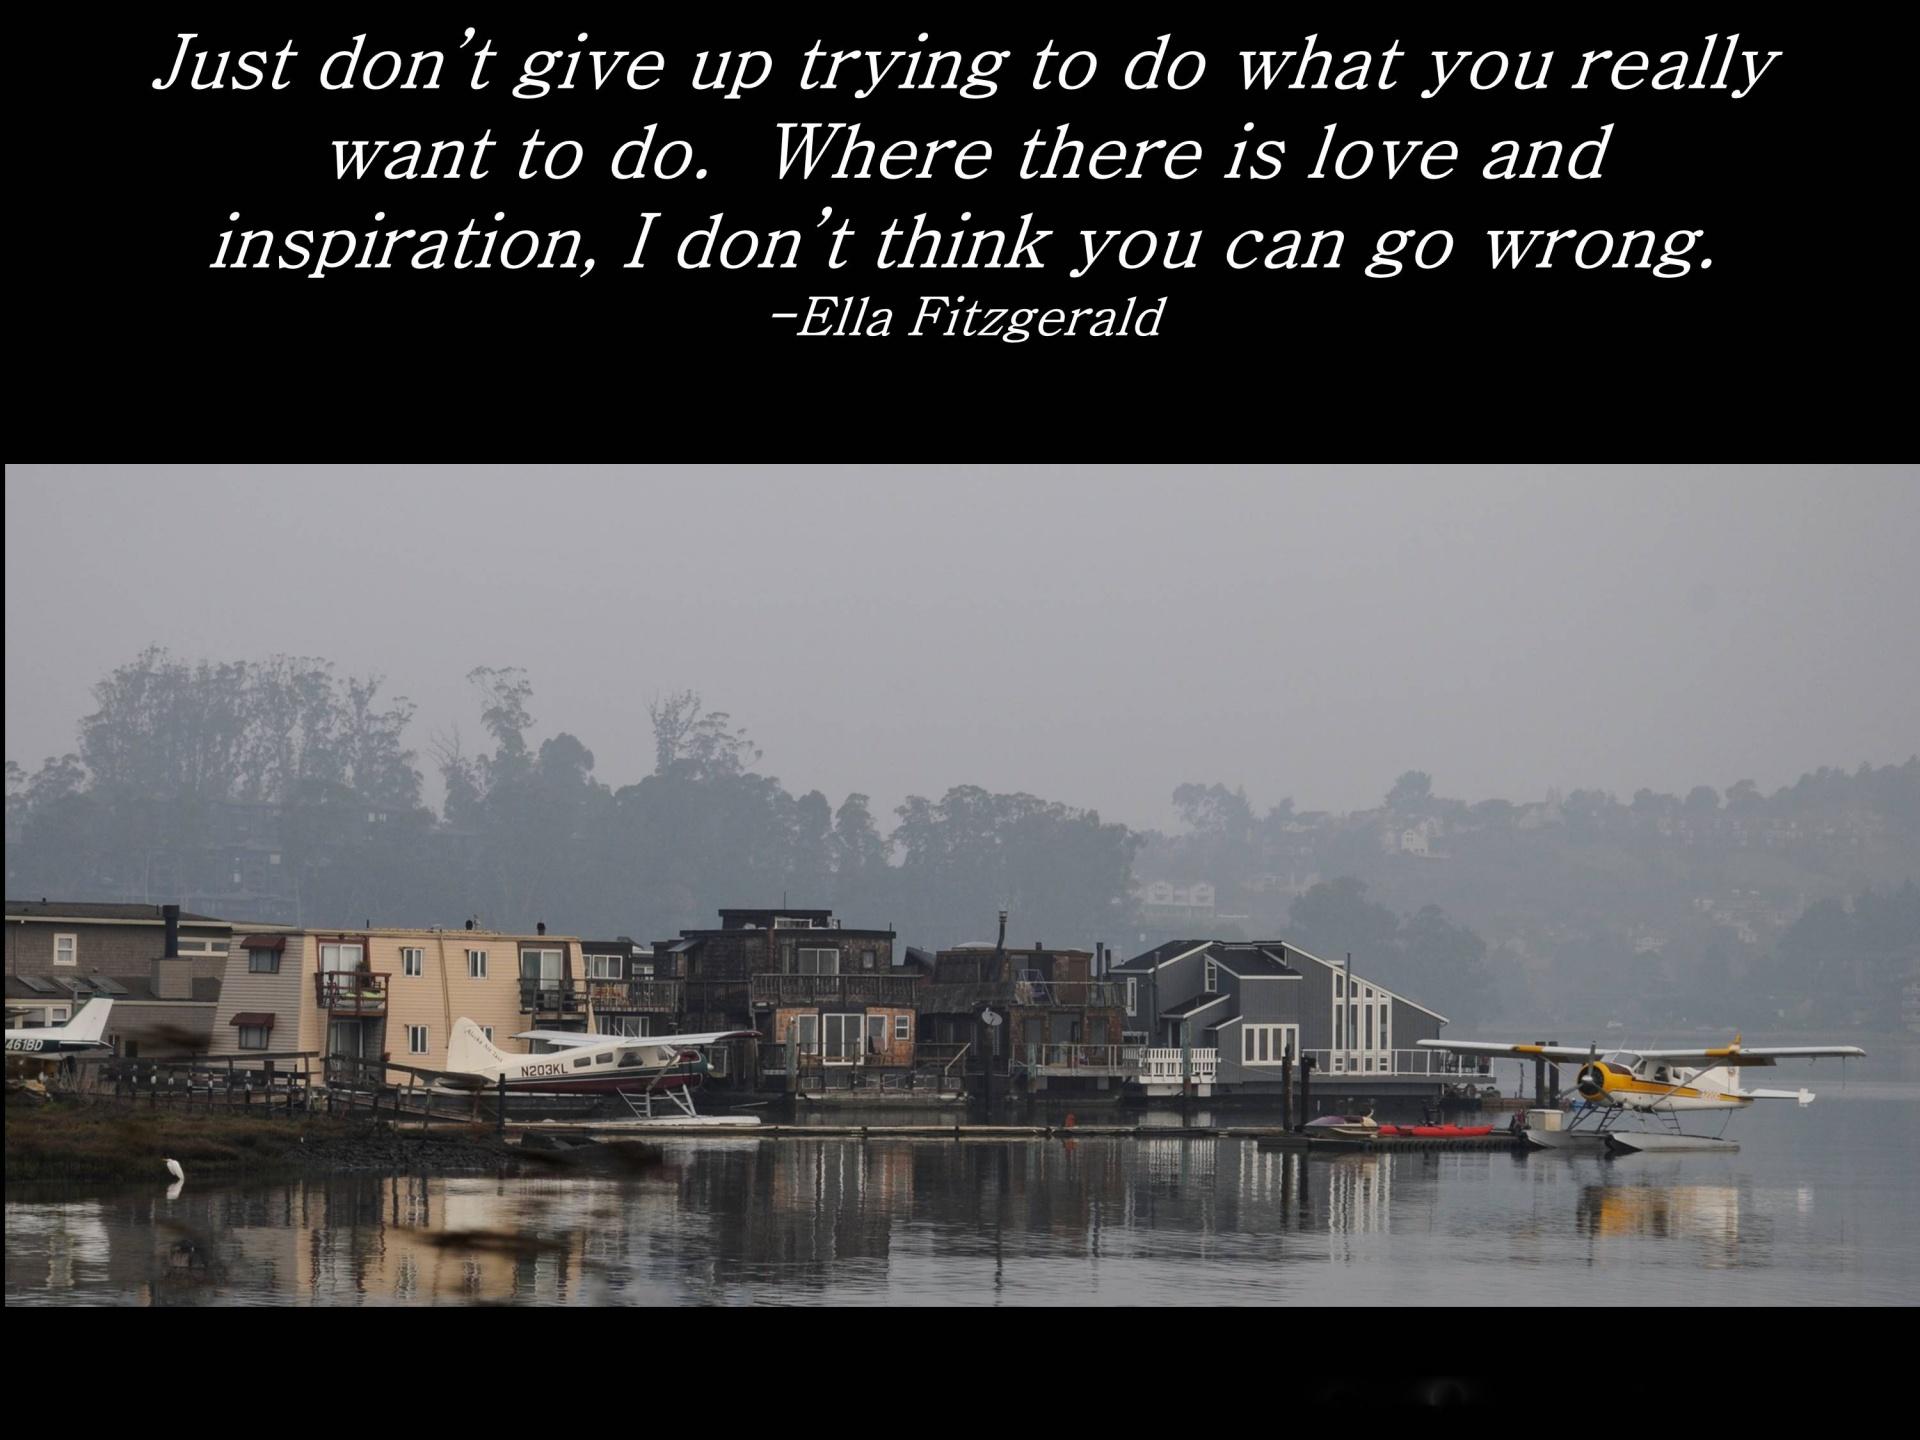 Ella Fitzgerald, Inspirational Quote, Poetry, Music, Encouragement